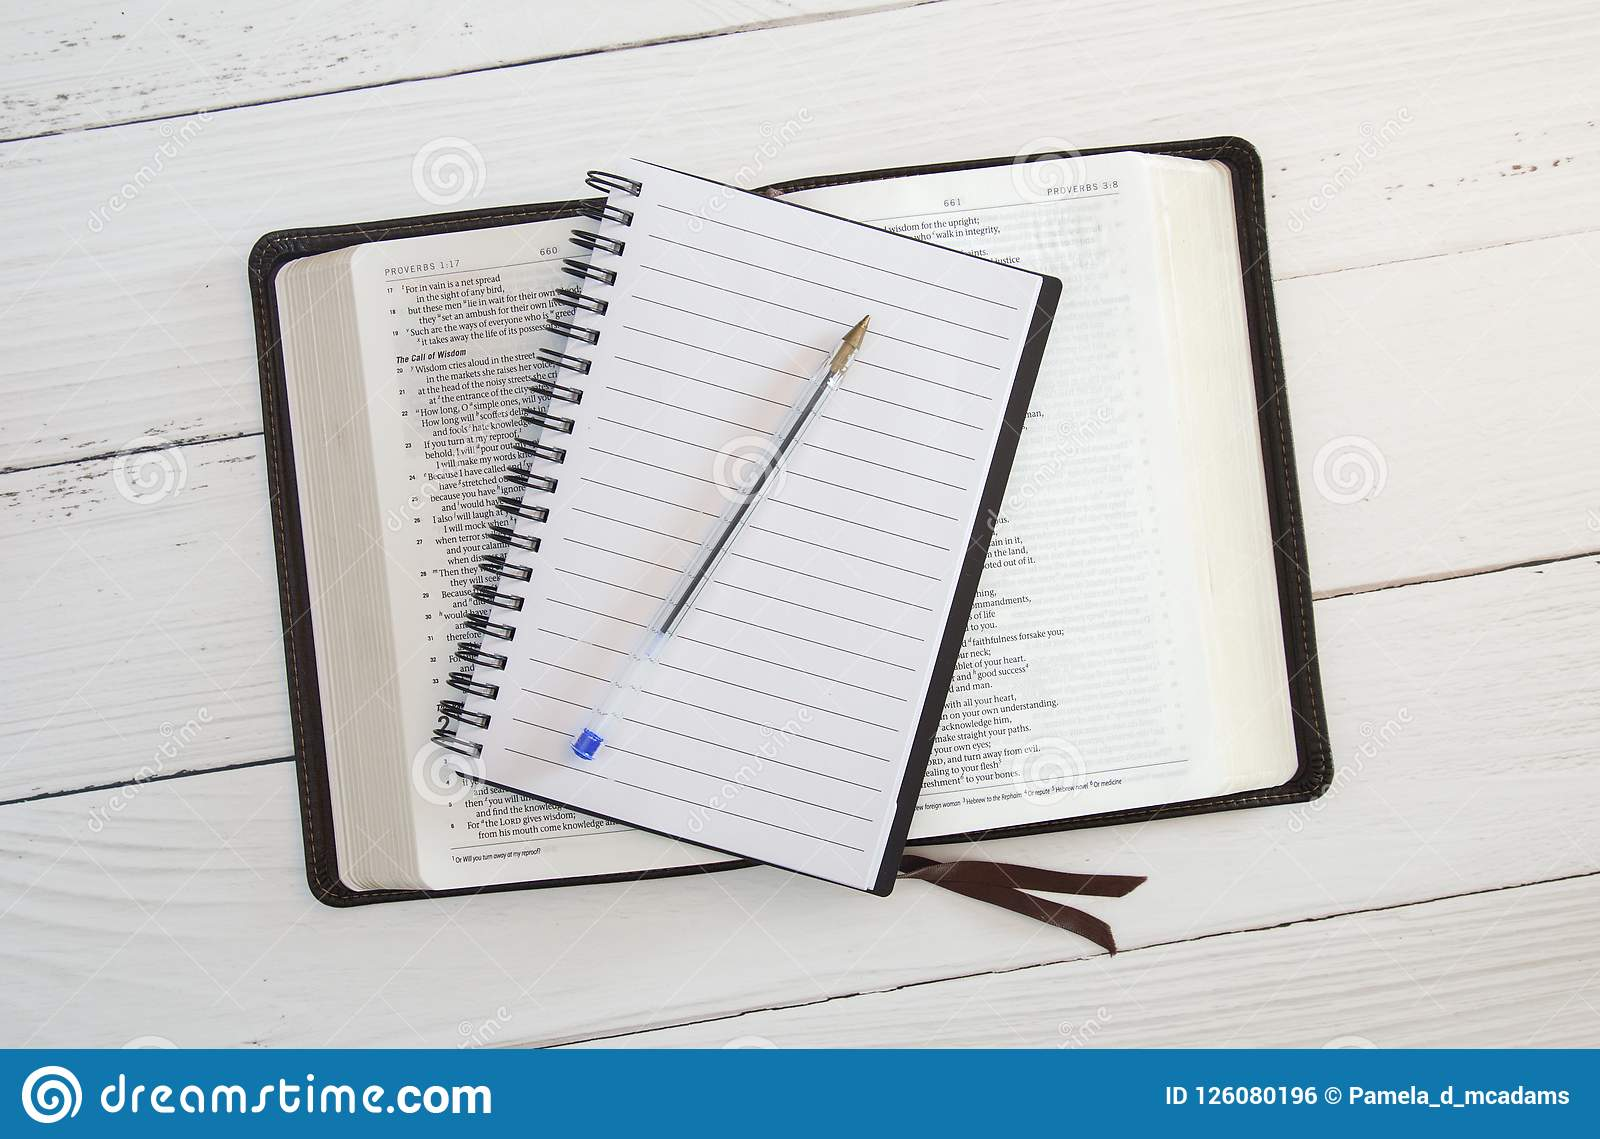 Bible Study Background Stock Photo Image Of Encouragement 126080196